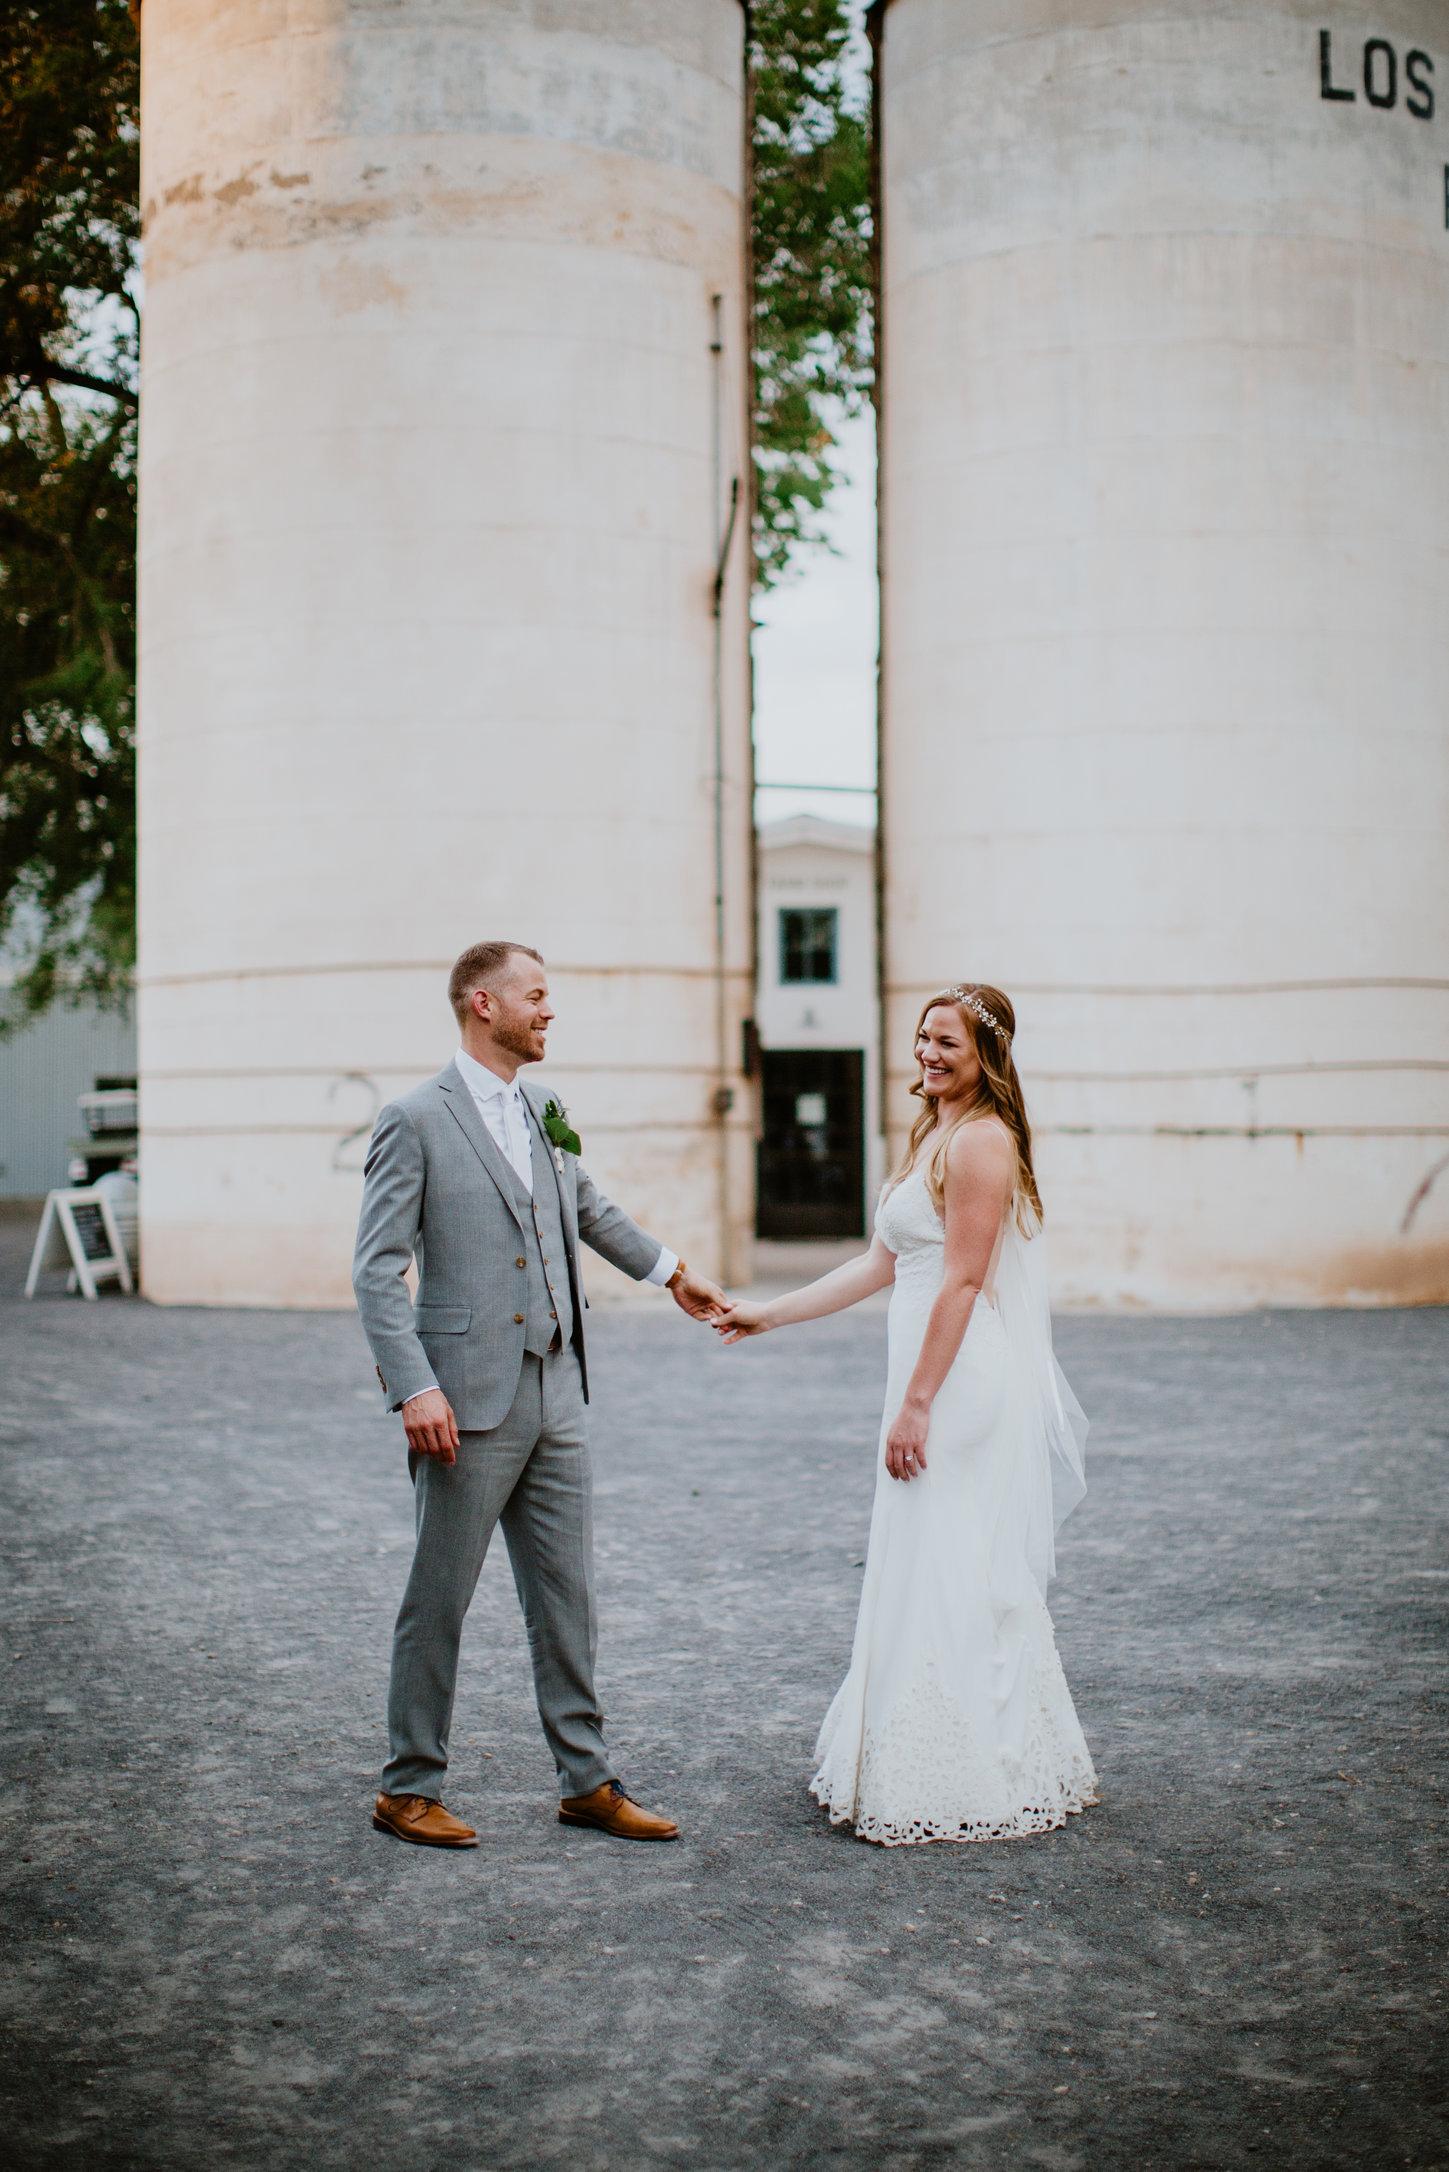 DandA-wedding-751.jpg